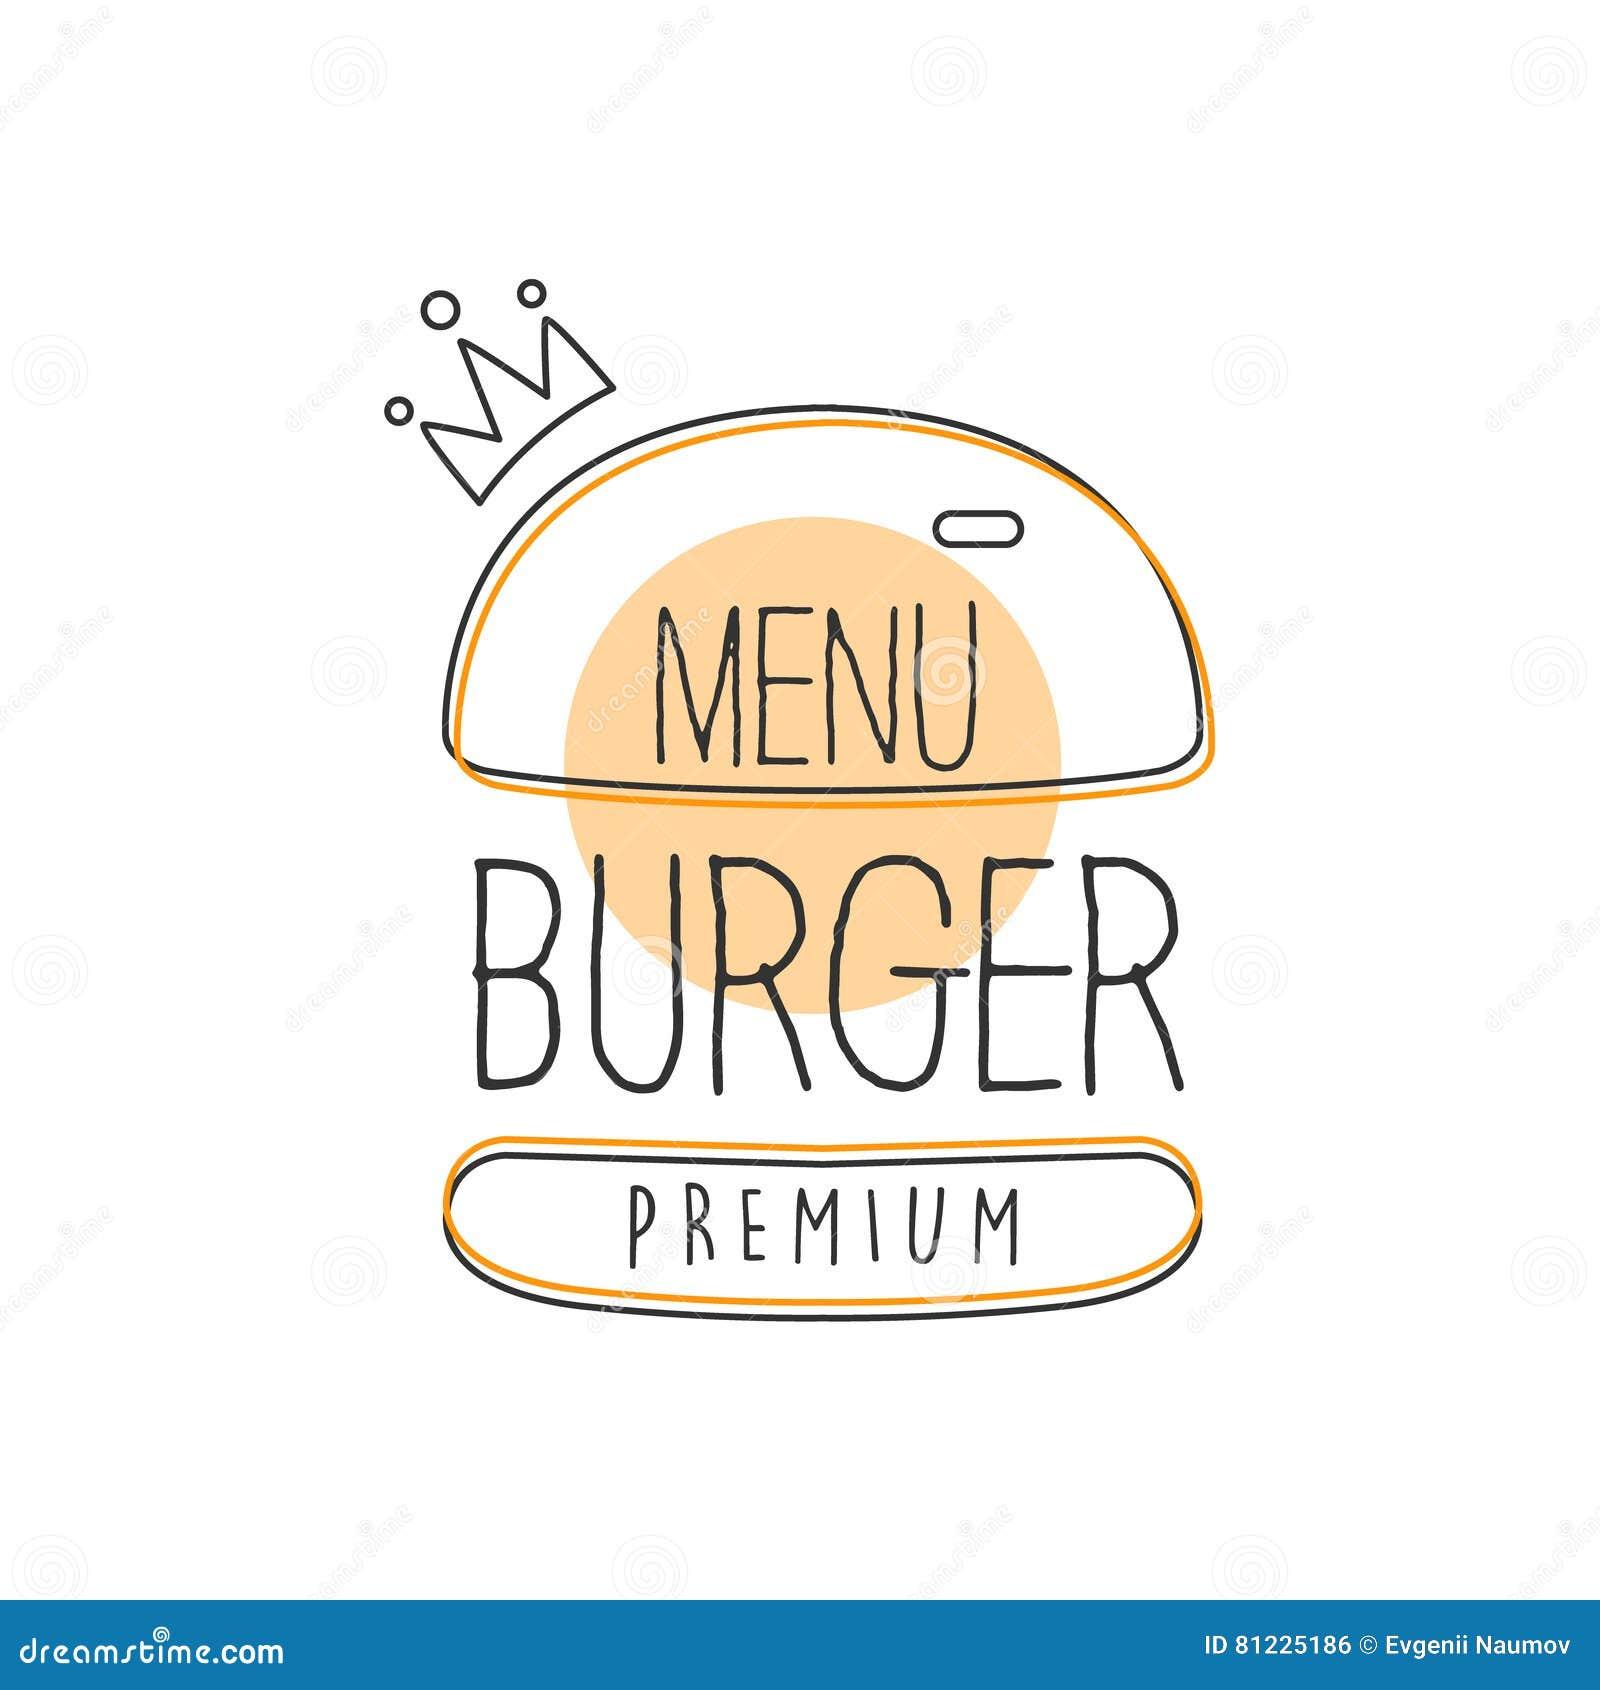 burger wih crown premium quality fast food street cafe menu